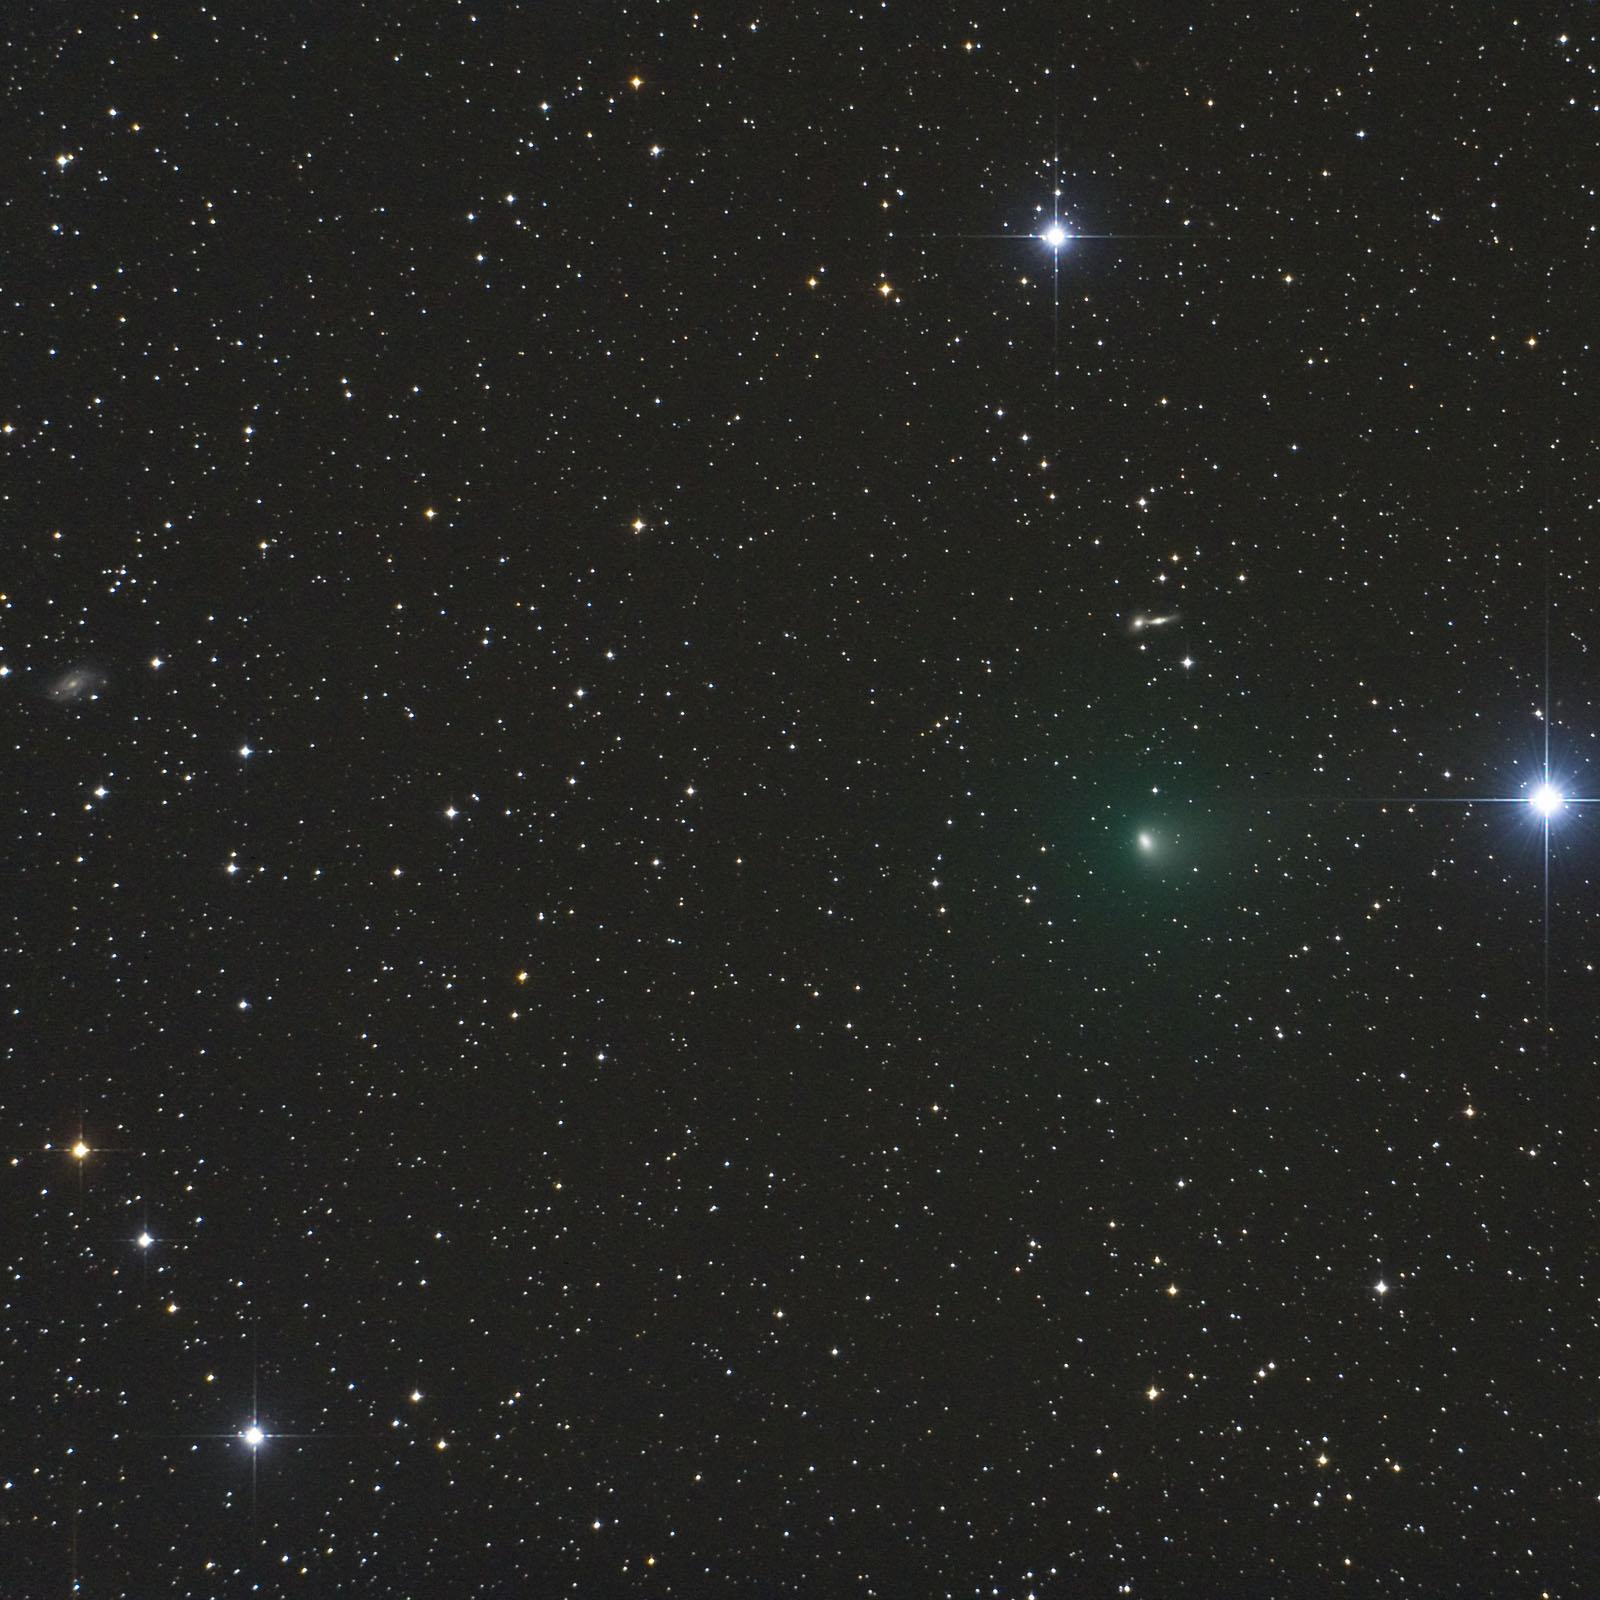 C2006_of2_081219_4x10m_star_tr